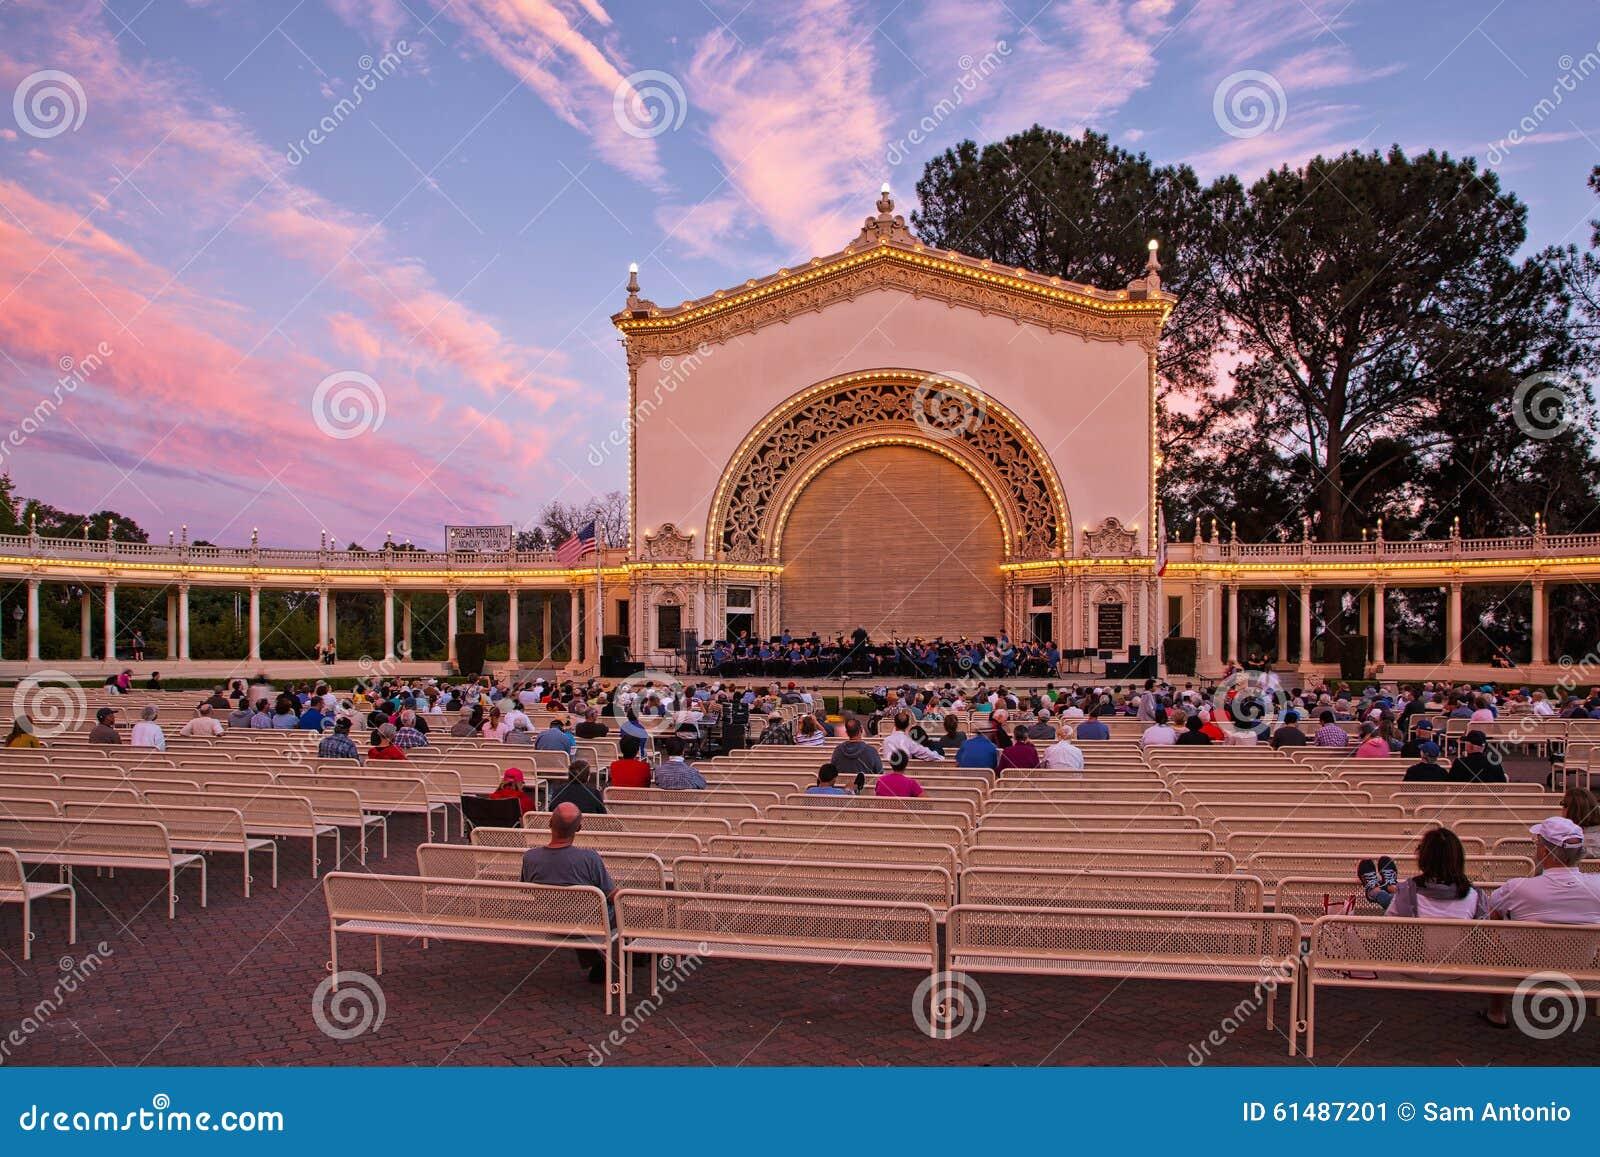 spreckels organ pavilion at sunset balboa park san diego california editorial photo image. Black Bedroom Furniture Sets. Home Design Ideas